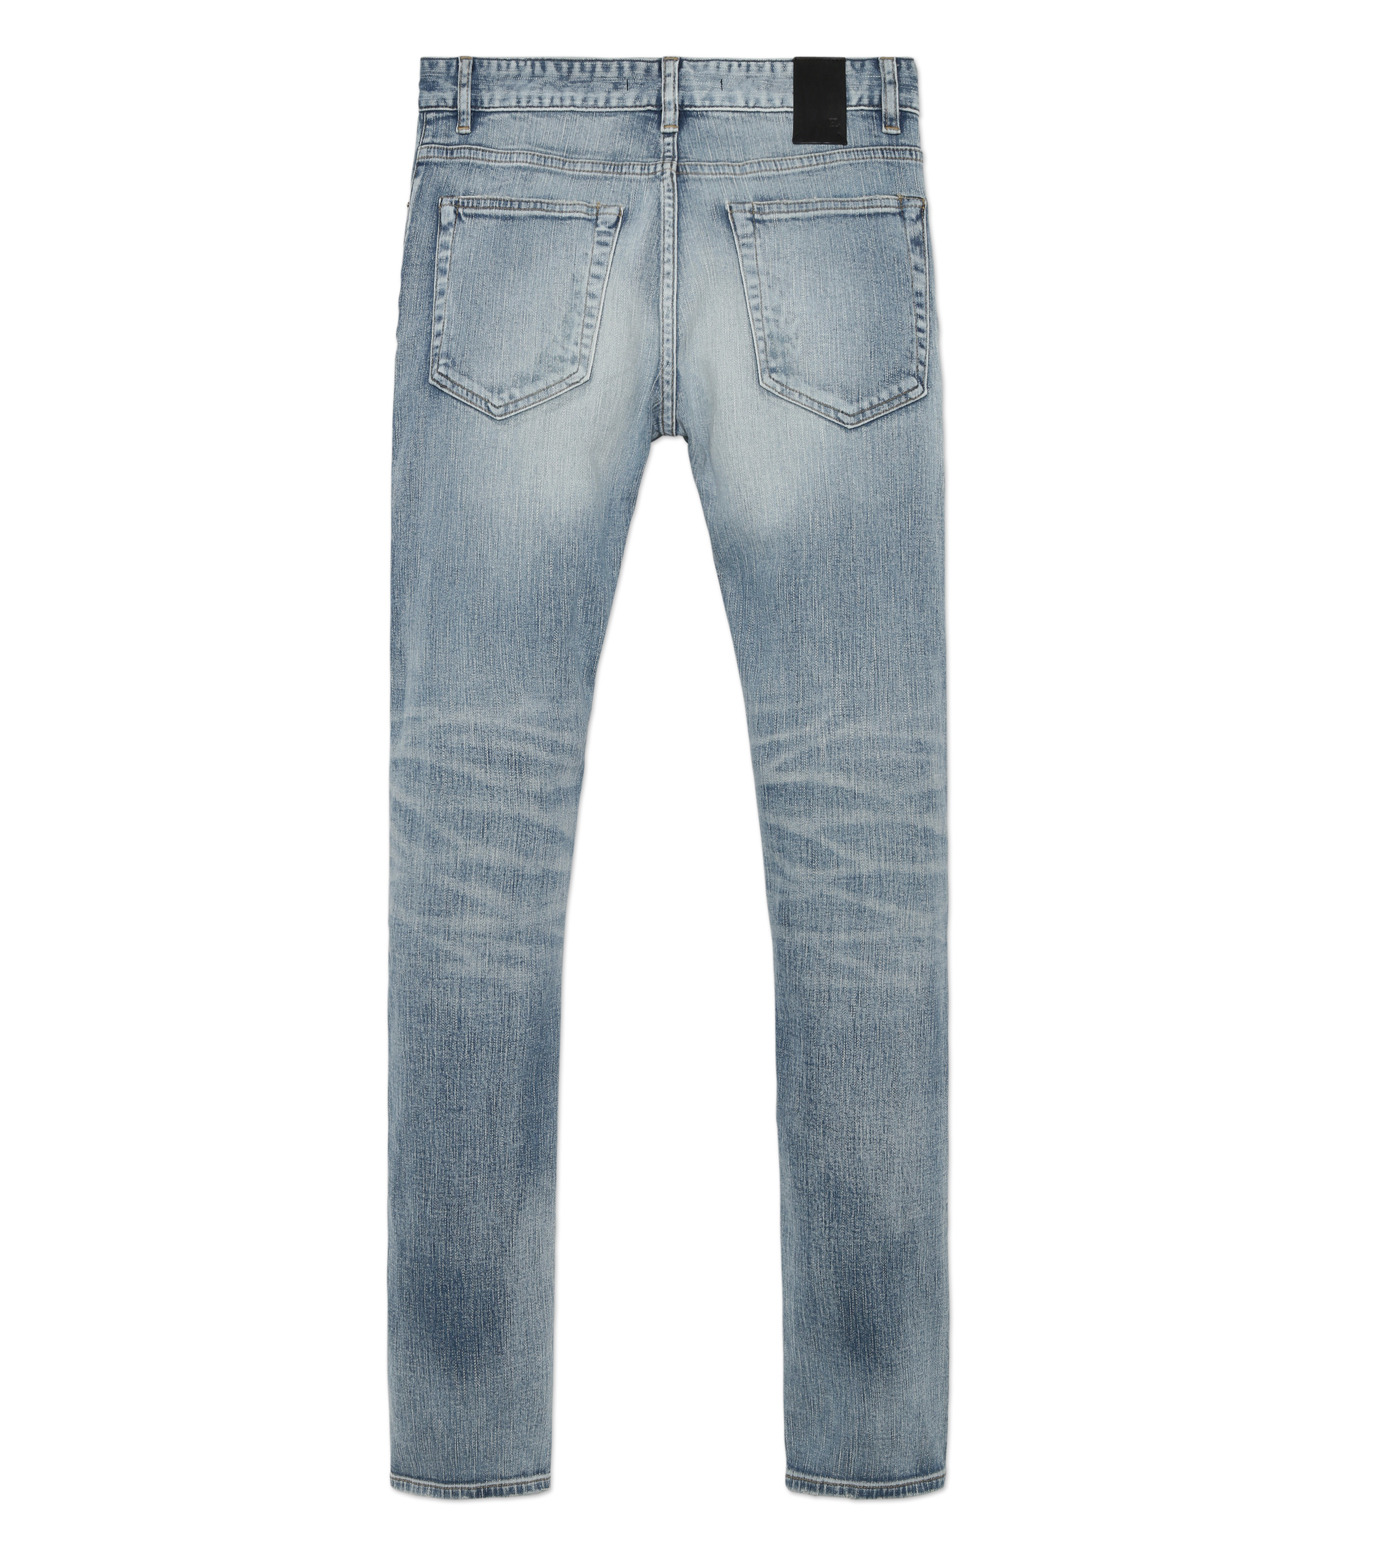 HL HEDDIE LOVU(エイチエル・エディールーヴ)のind damage3 skin slim-BLUE(パンツ/pants)-18S98002-92 拡大詳細画像5